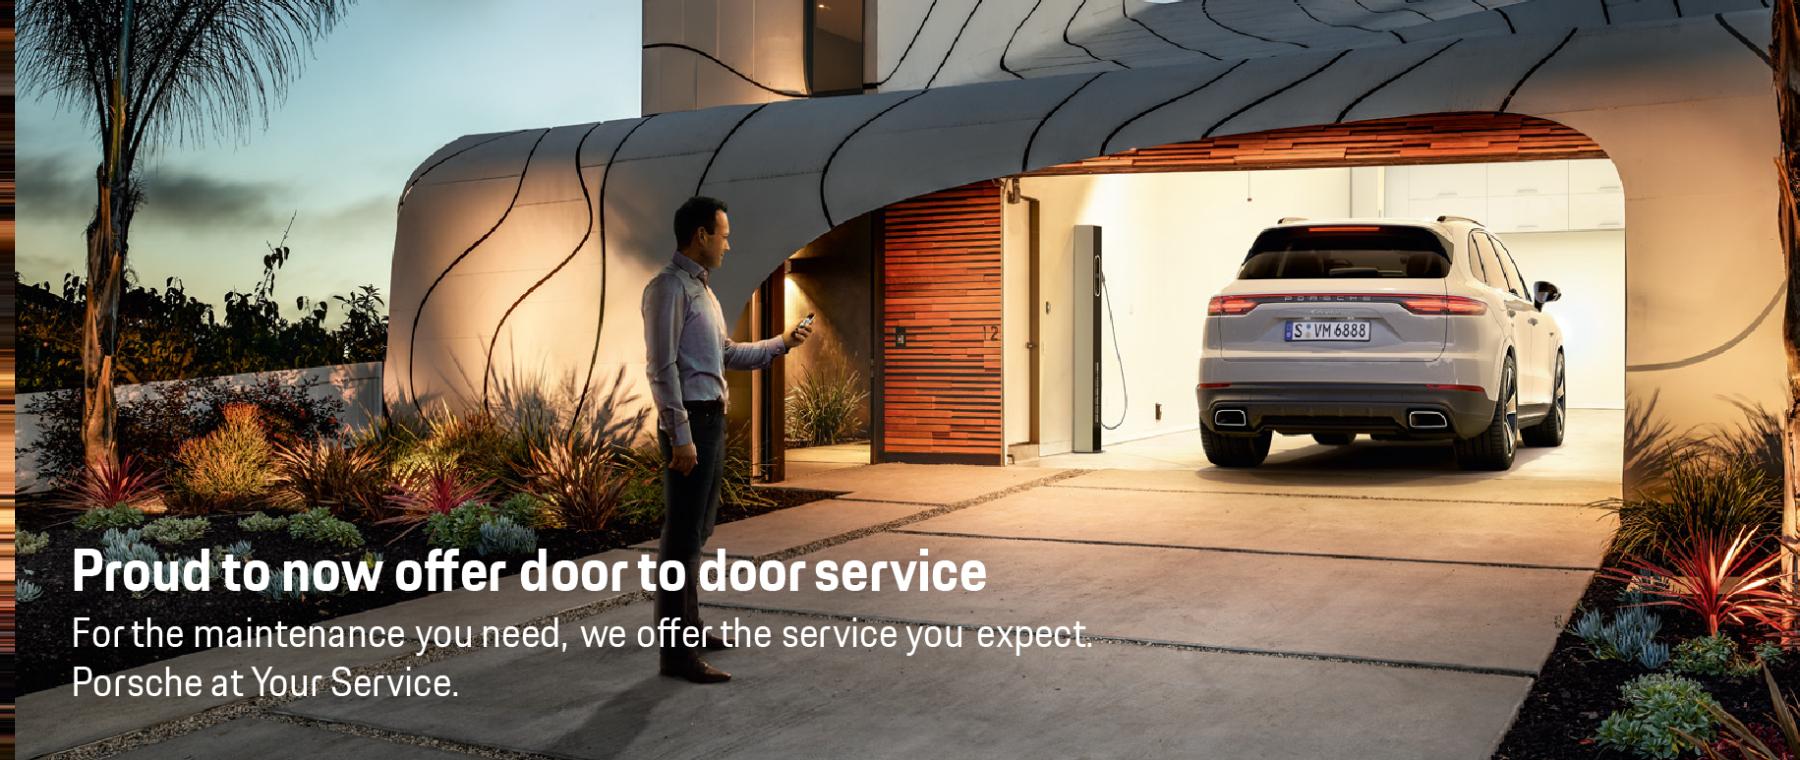 Porsche at your service – DI